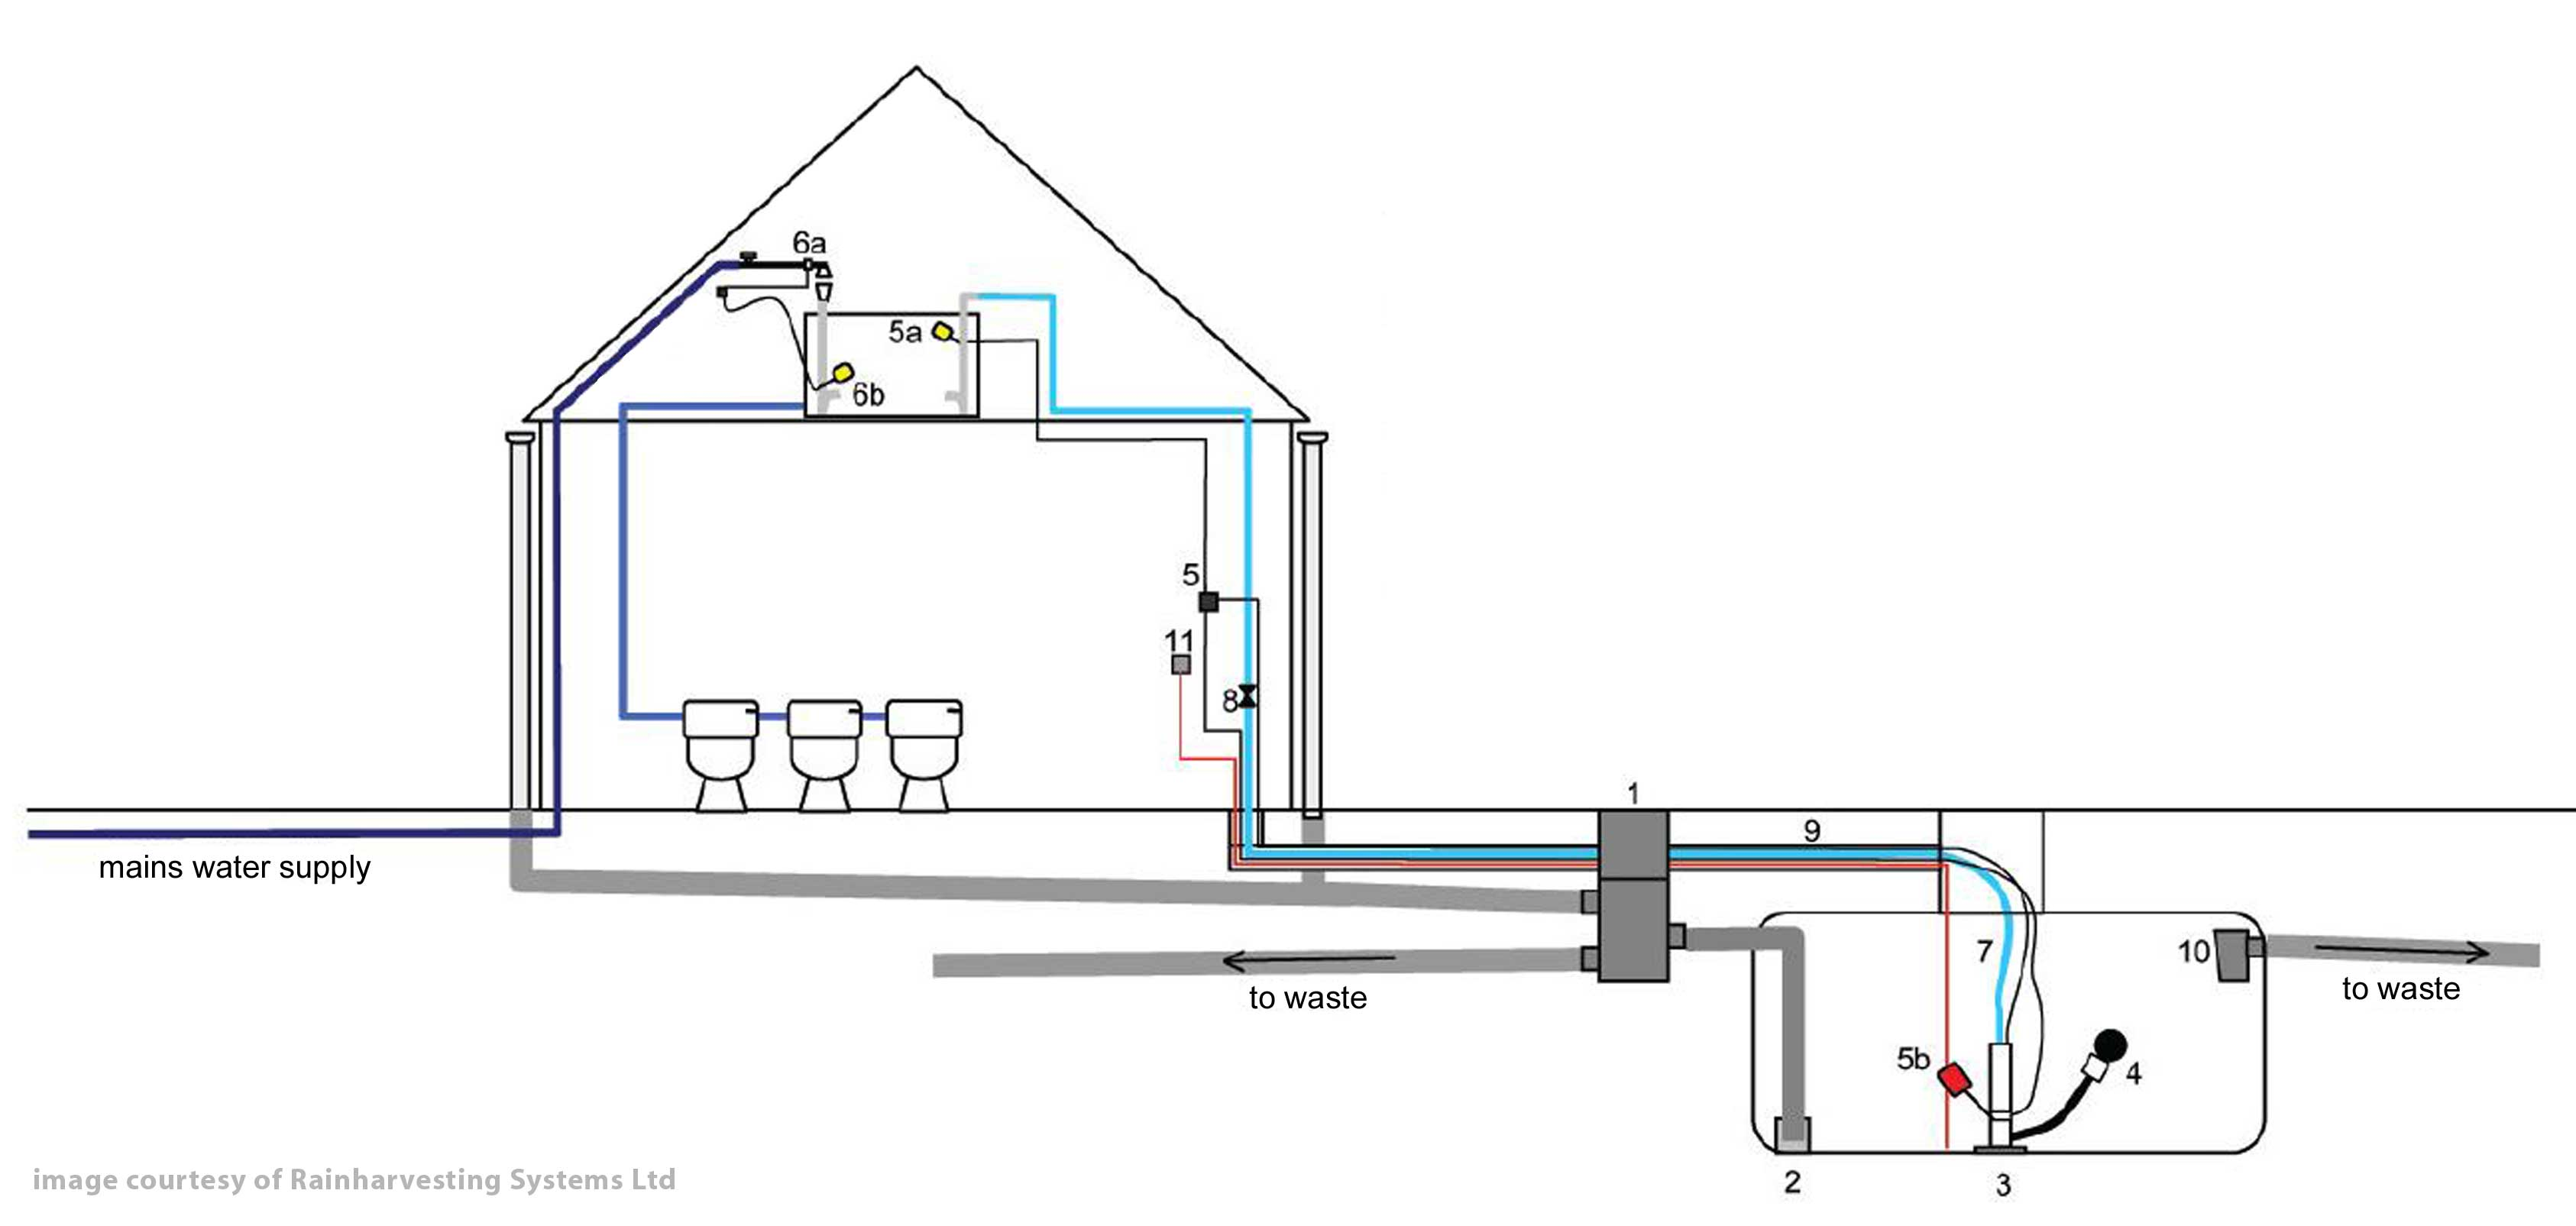 nuclear power plant diagram simple